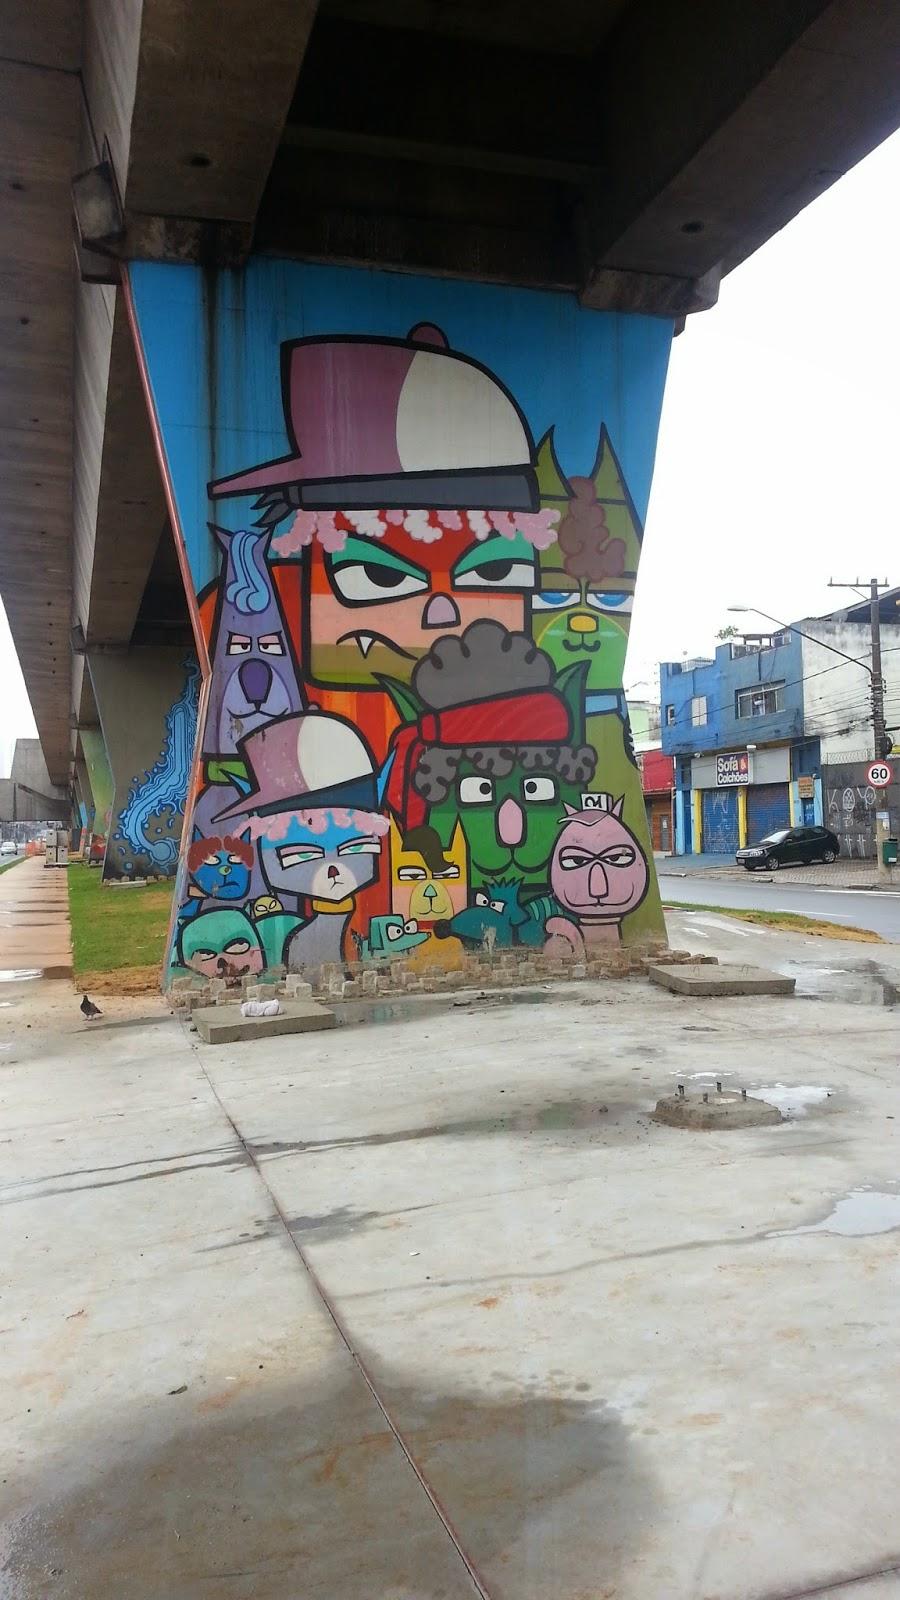 Trabalho da Artista Chivitz Minhau - Corrida de Rua